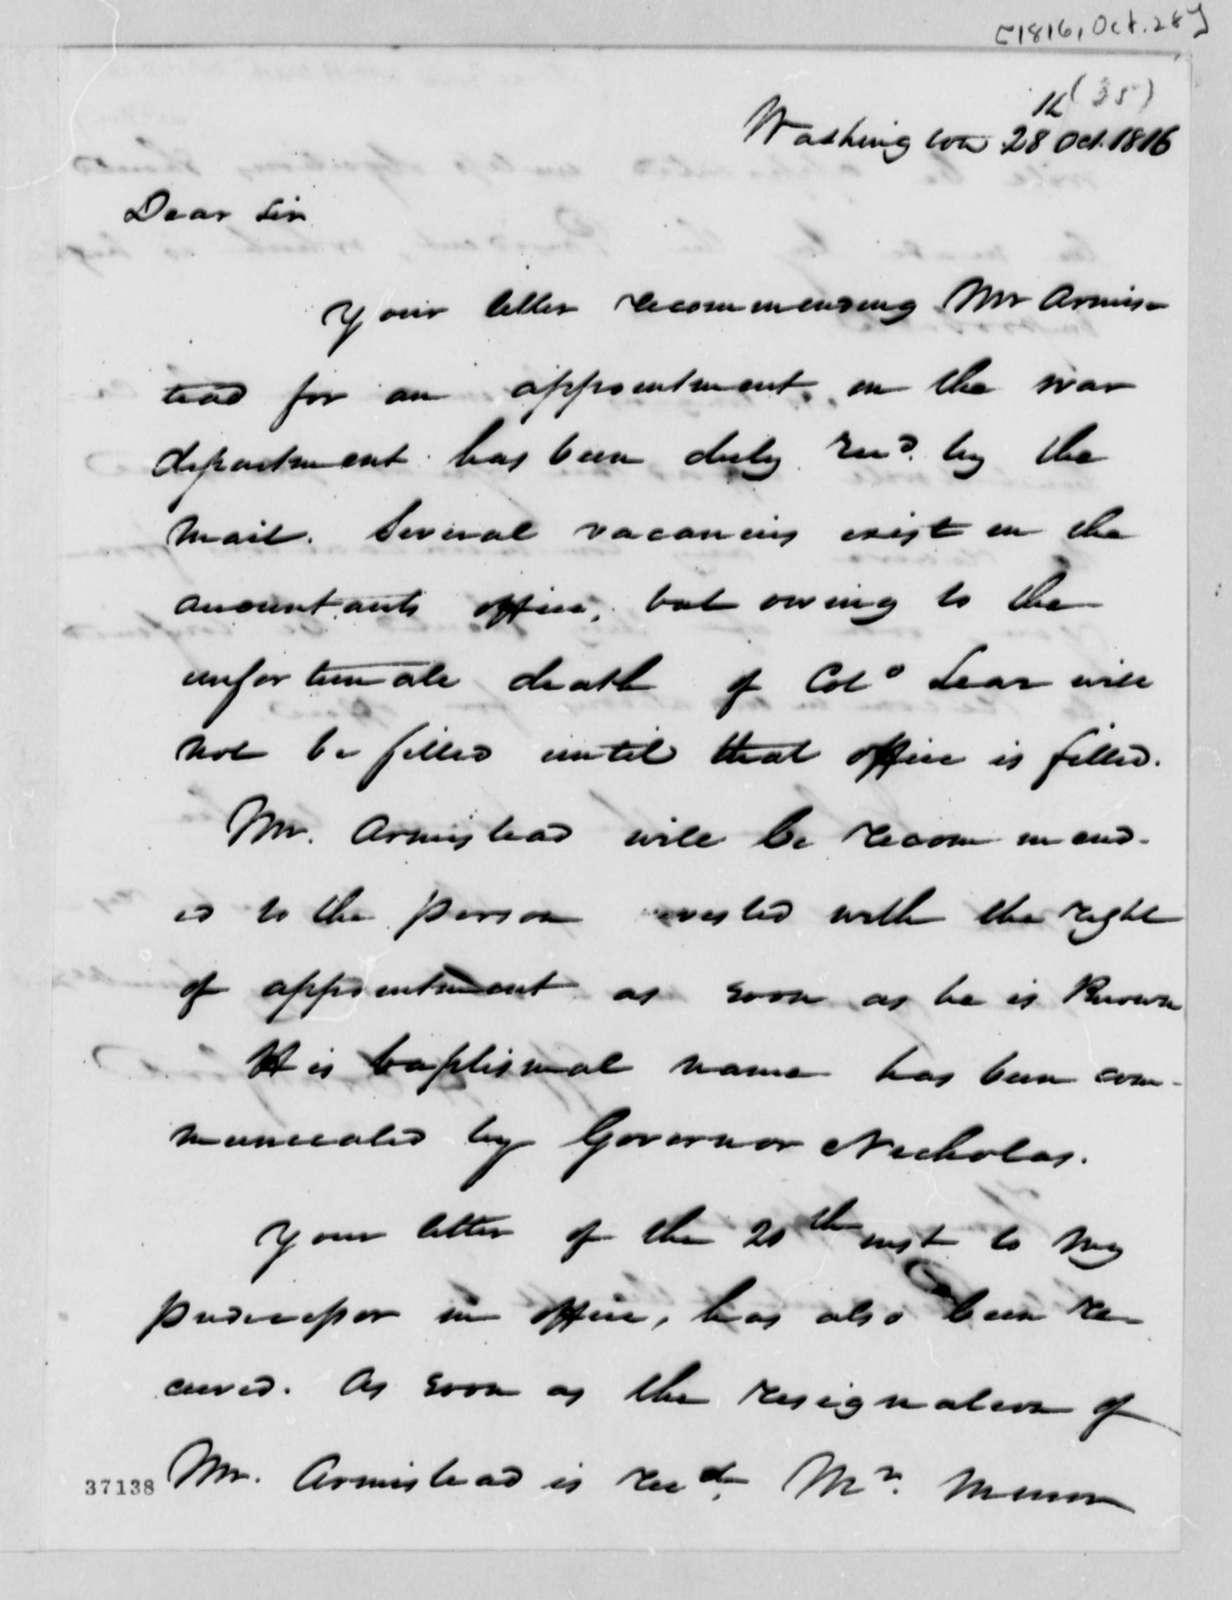 William H. Crawford to Thomas Jefferson, October 28, 1816